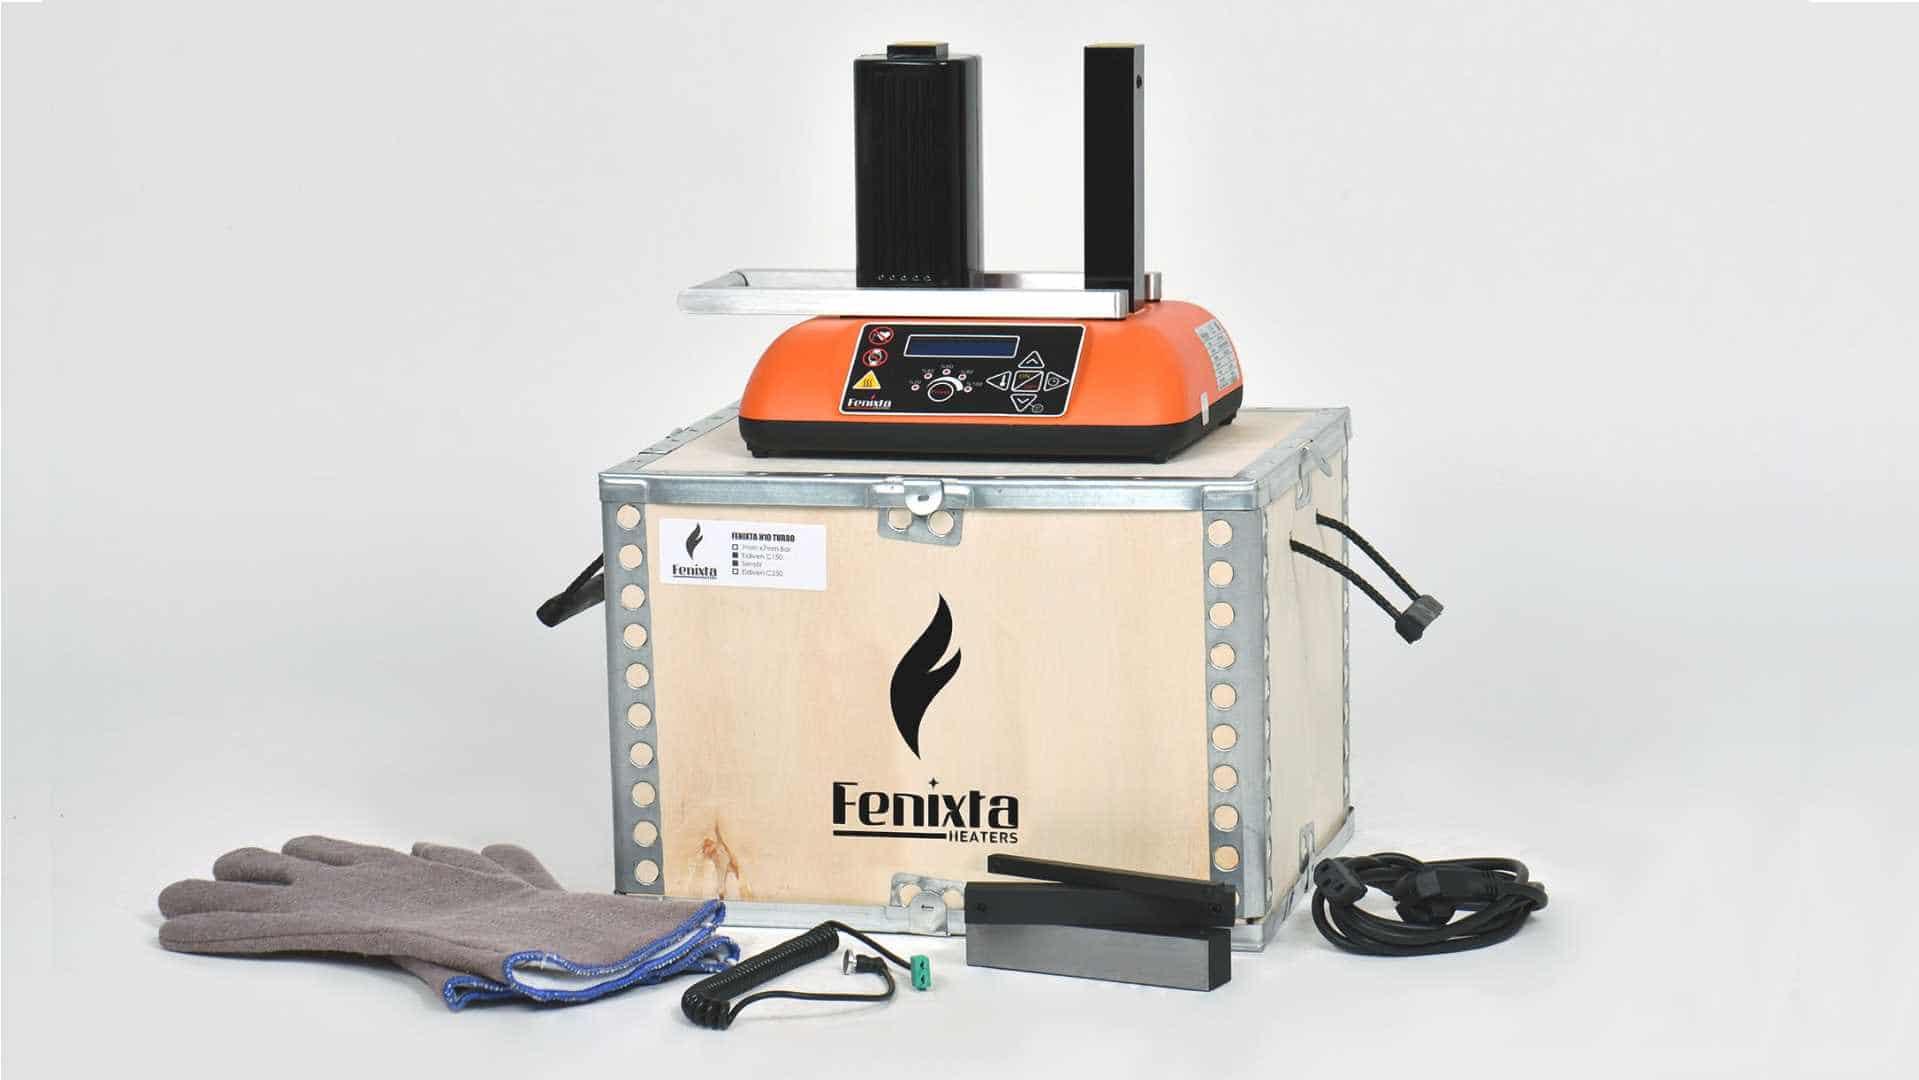 Fenixta H10 turbo rulman ısıtma cihazı kutu içeriği